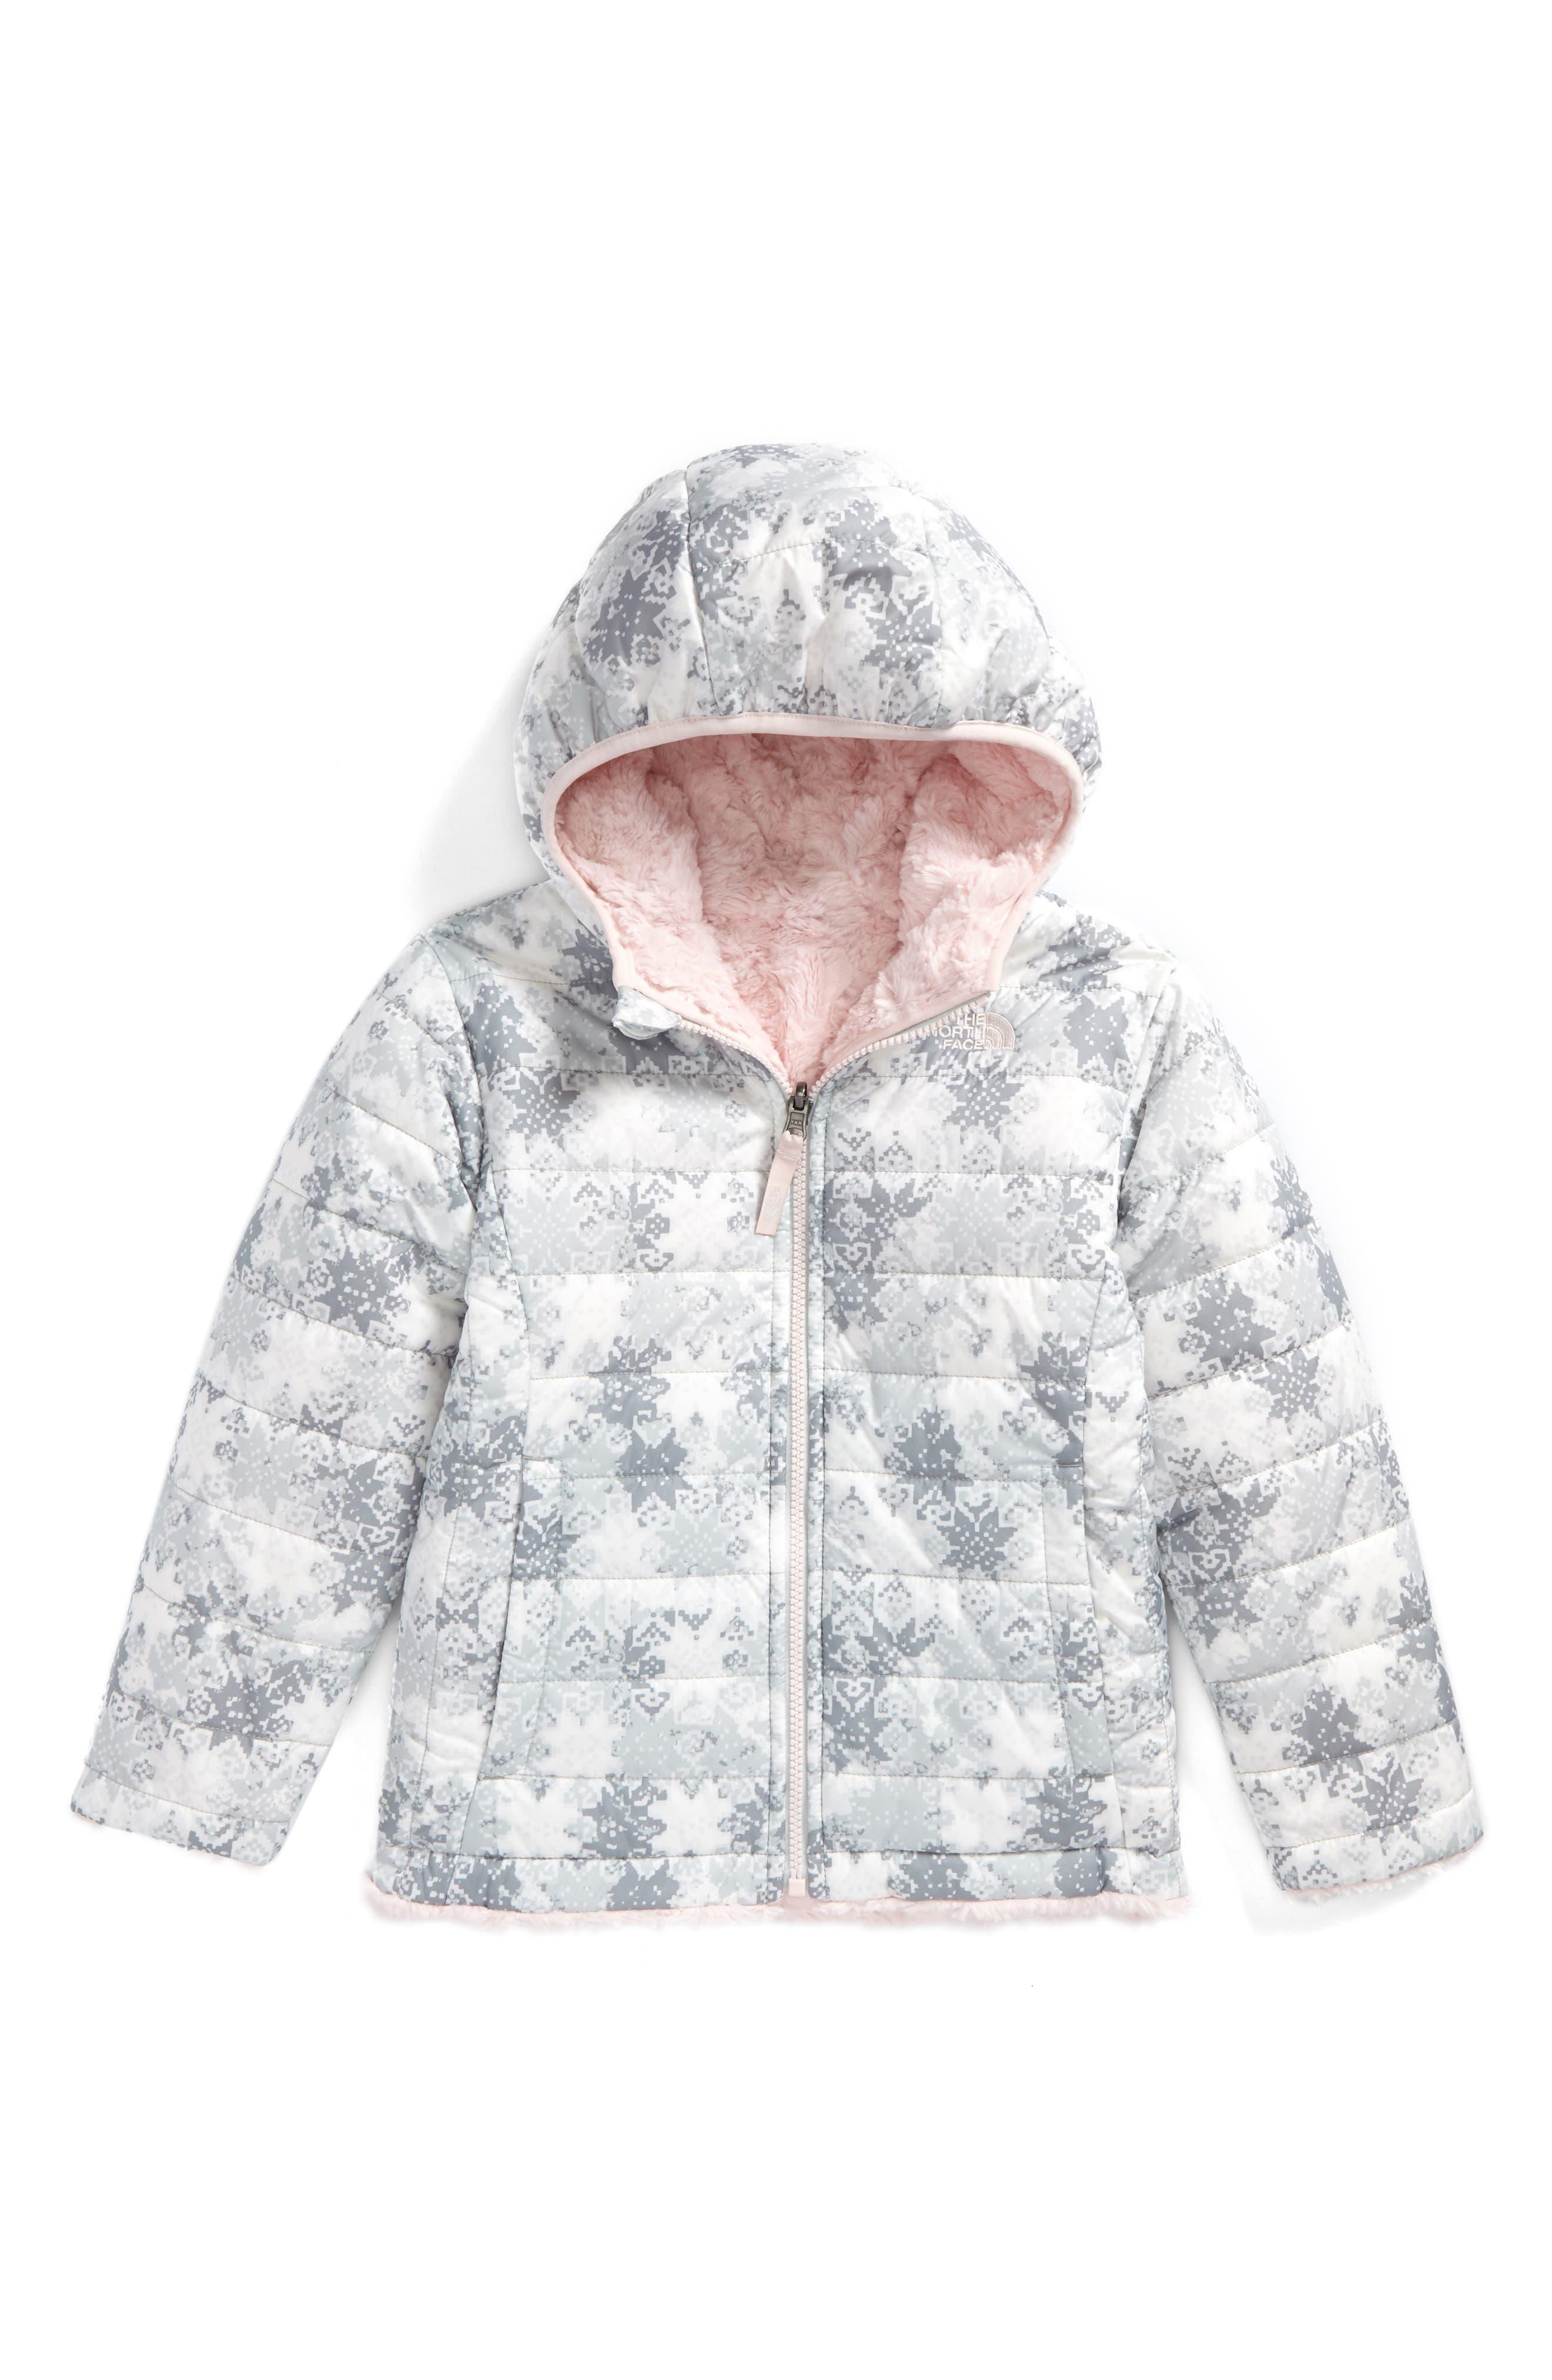 Mossbud Swirl Reversible Water Repellent Jacket,                         Main,                         color, 100